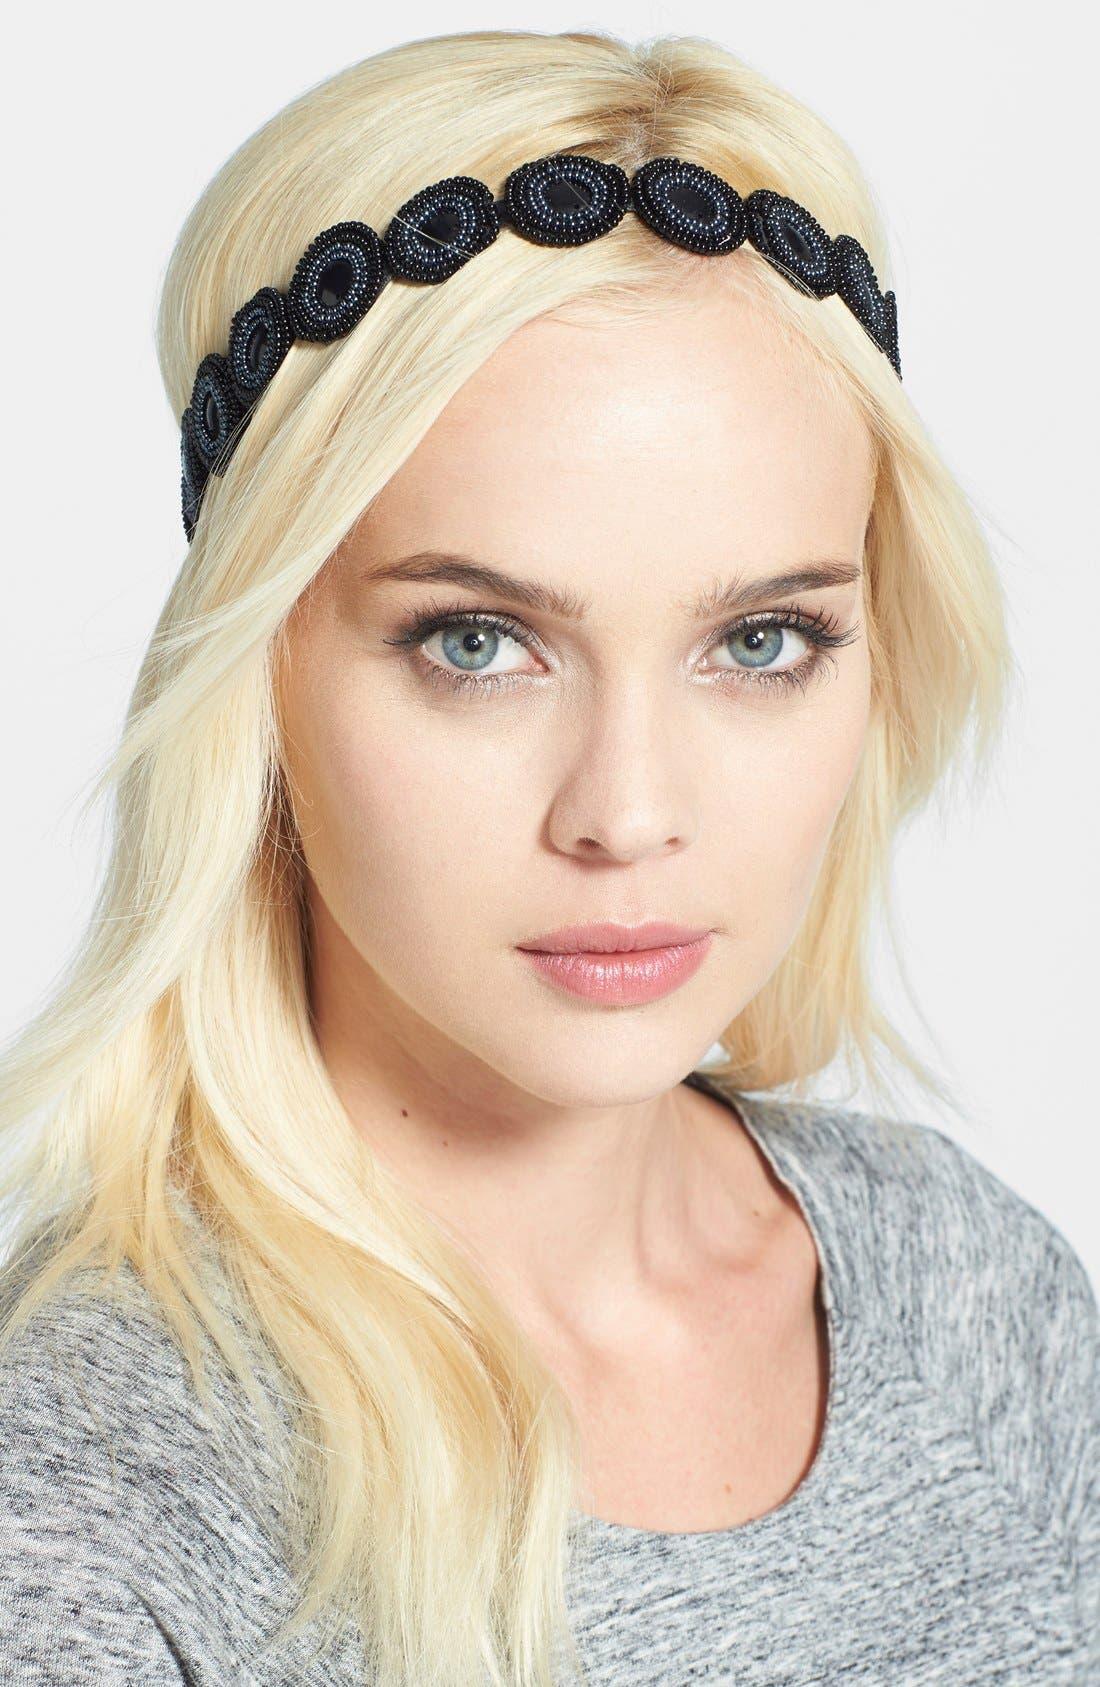 Main Image - Tasha 'Beaded in Glamour' Head Wrap